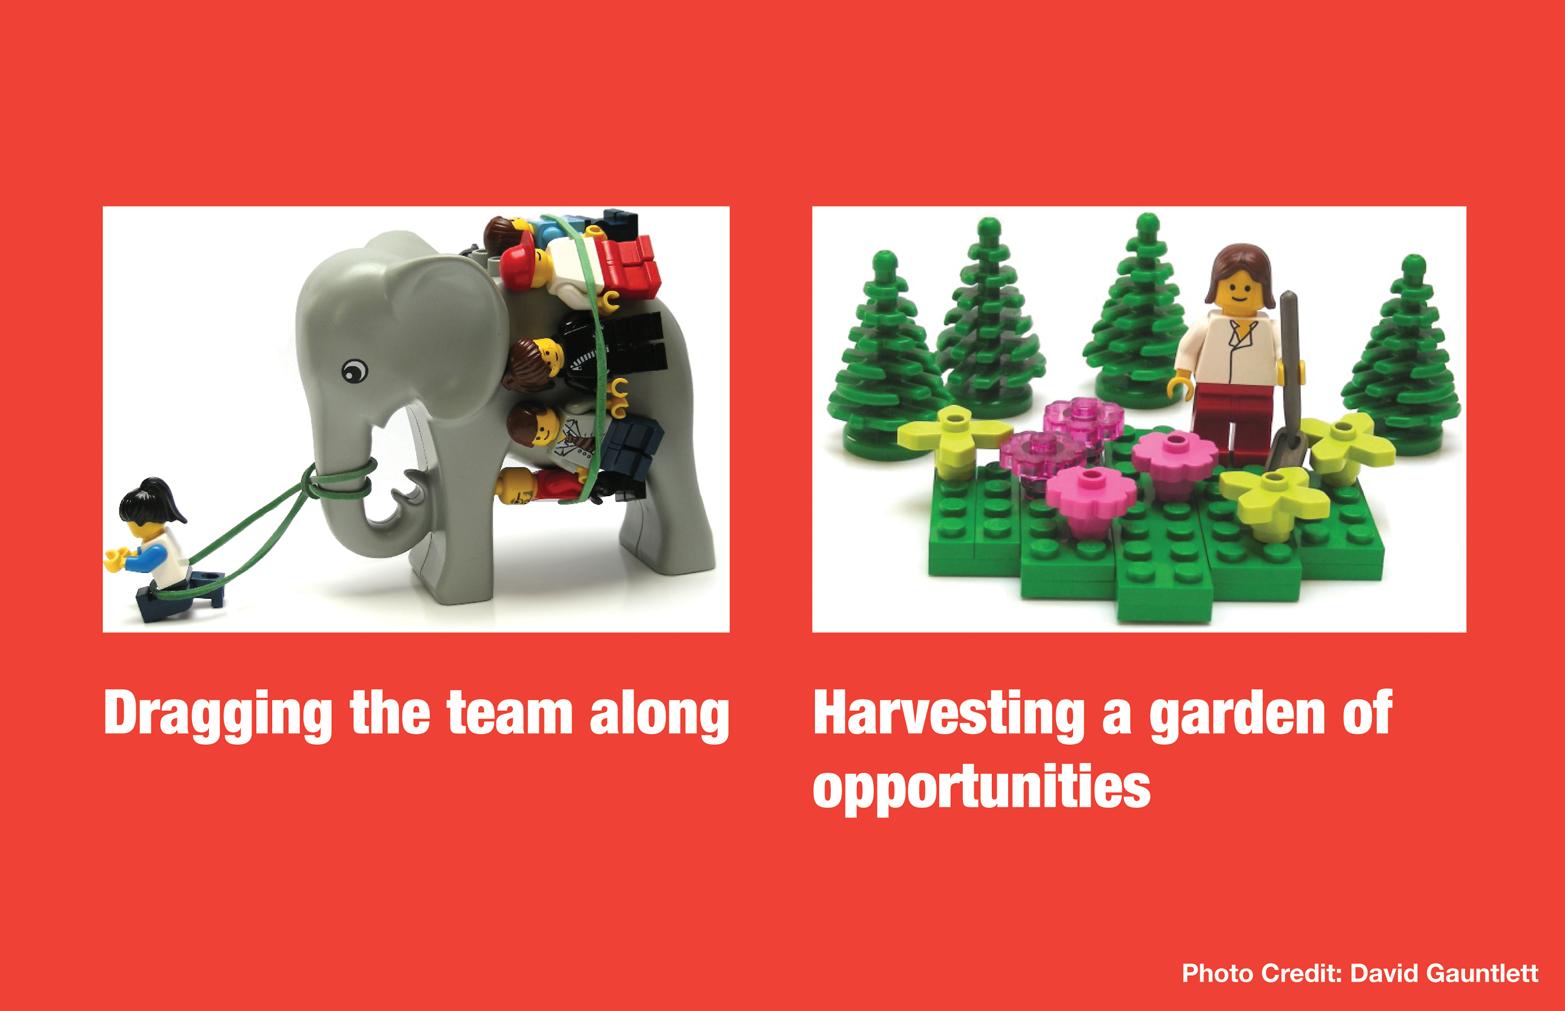 Exploring metaphors with Legos